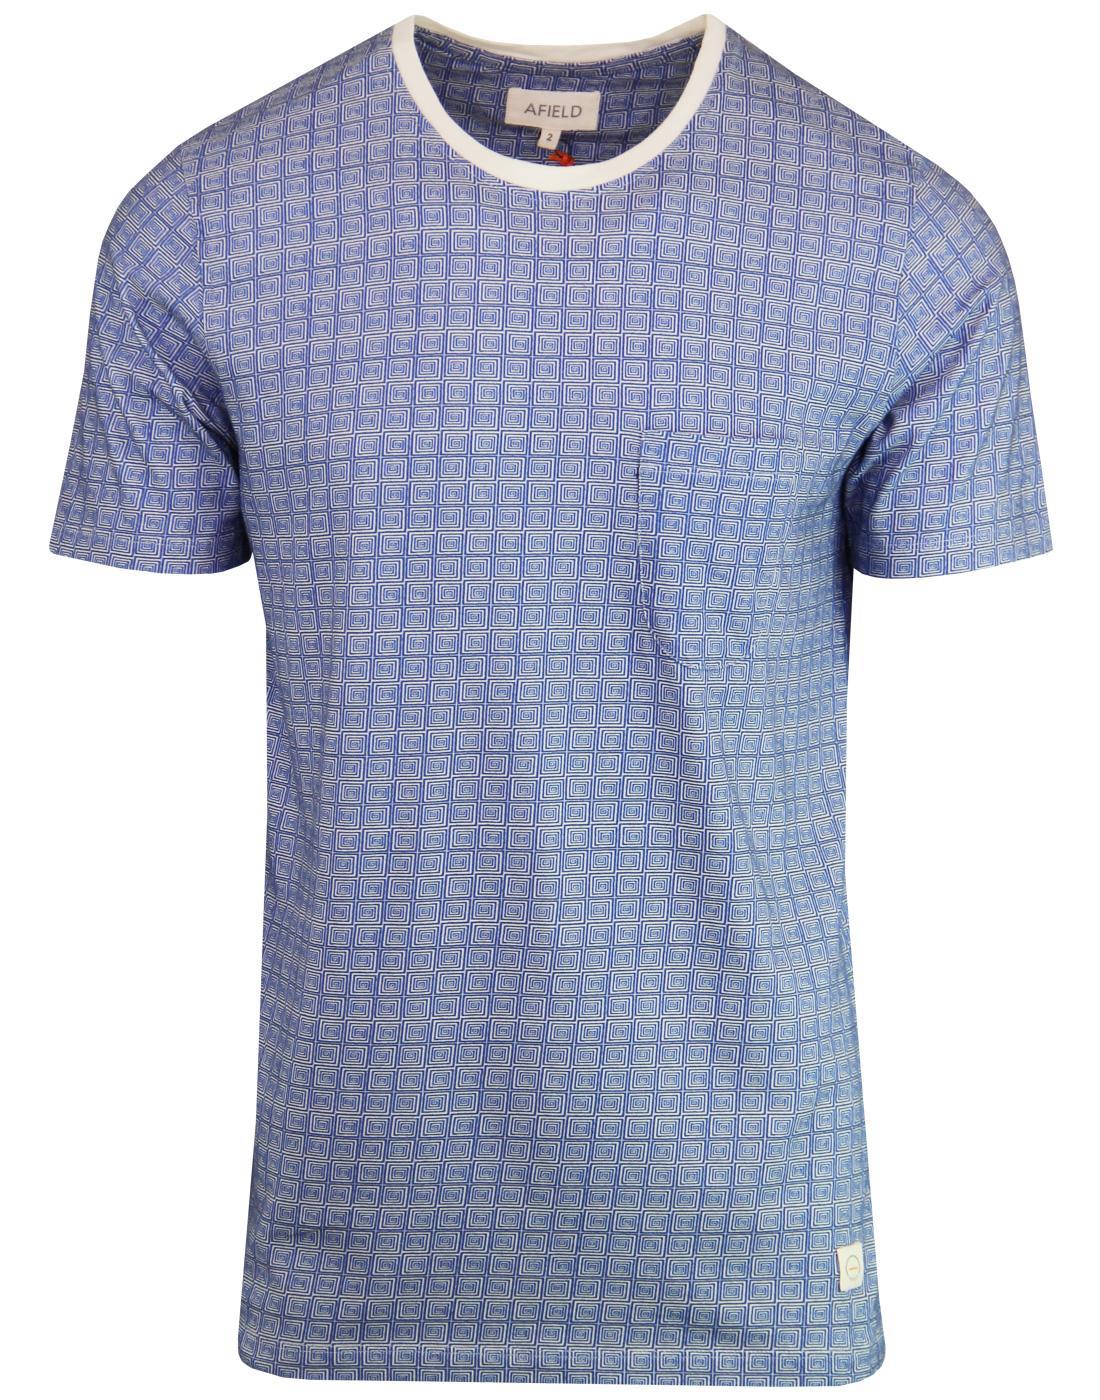 AFIELD Men's Retro 1970s Geo Spiral Square T-Shirt